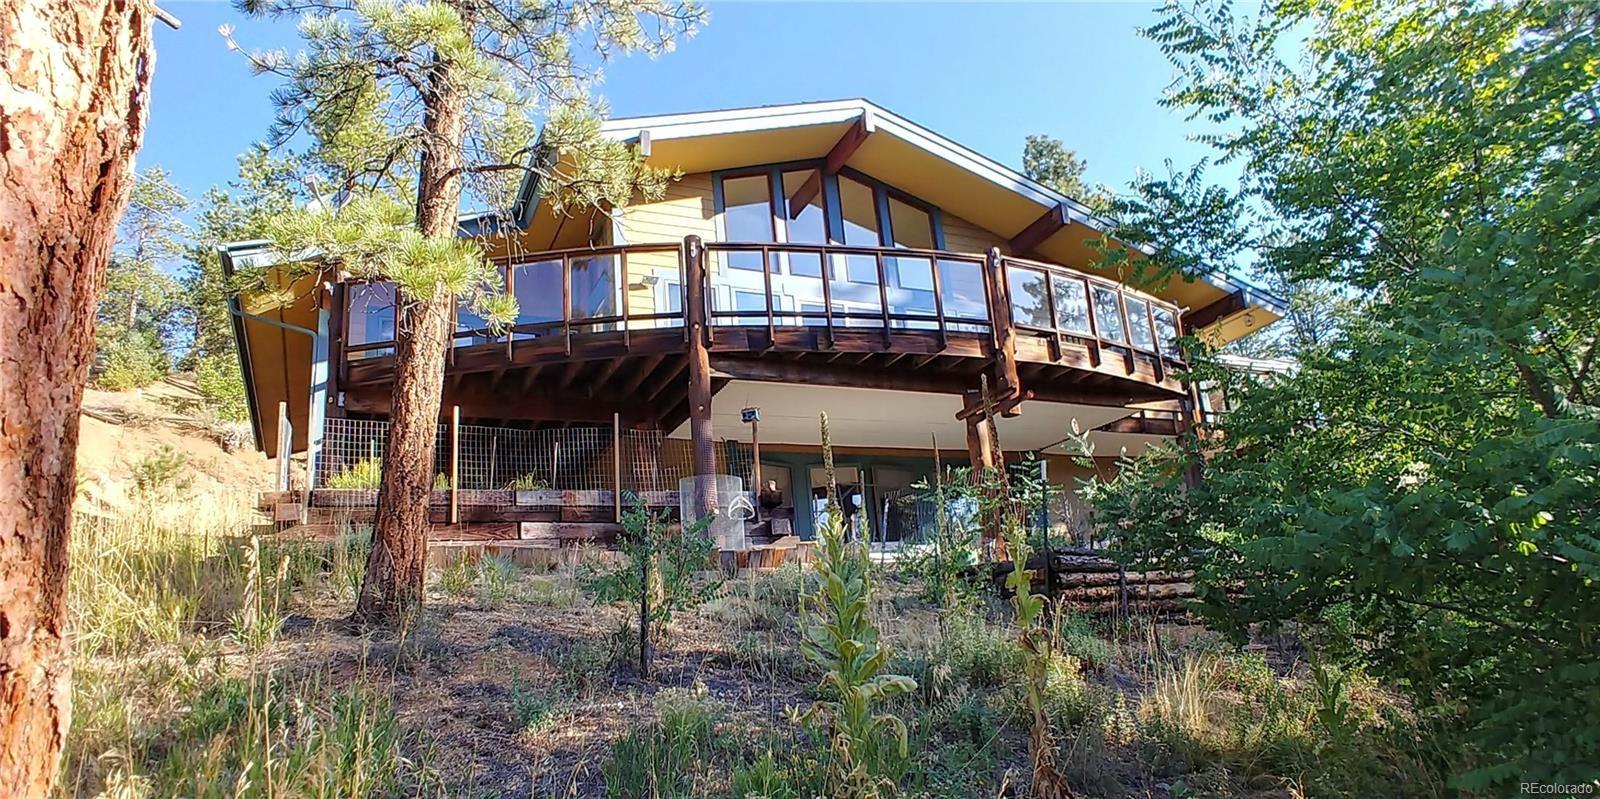 MLS# 4032743 - 1 - 1208 Alpine Drive, Sedalia, CO 80135